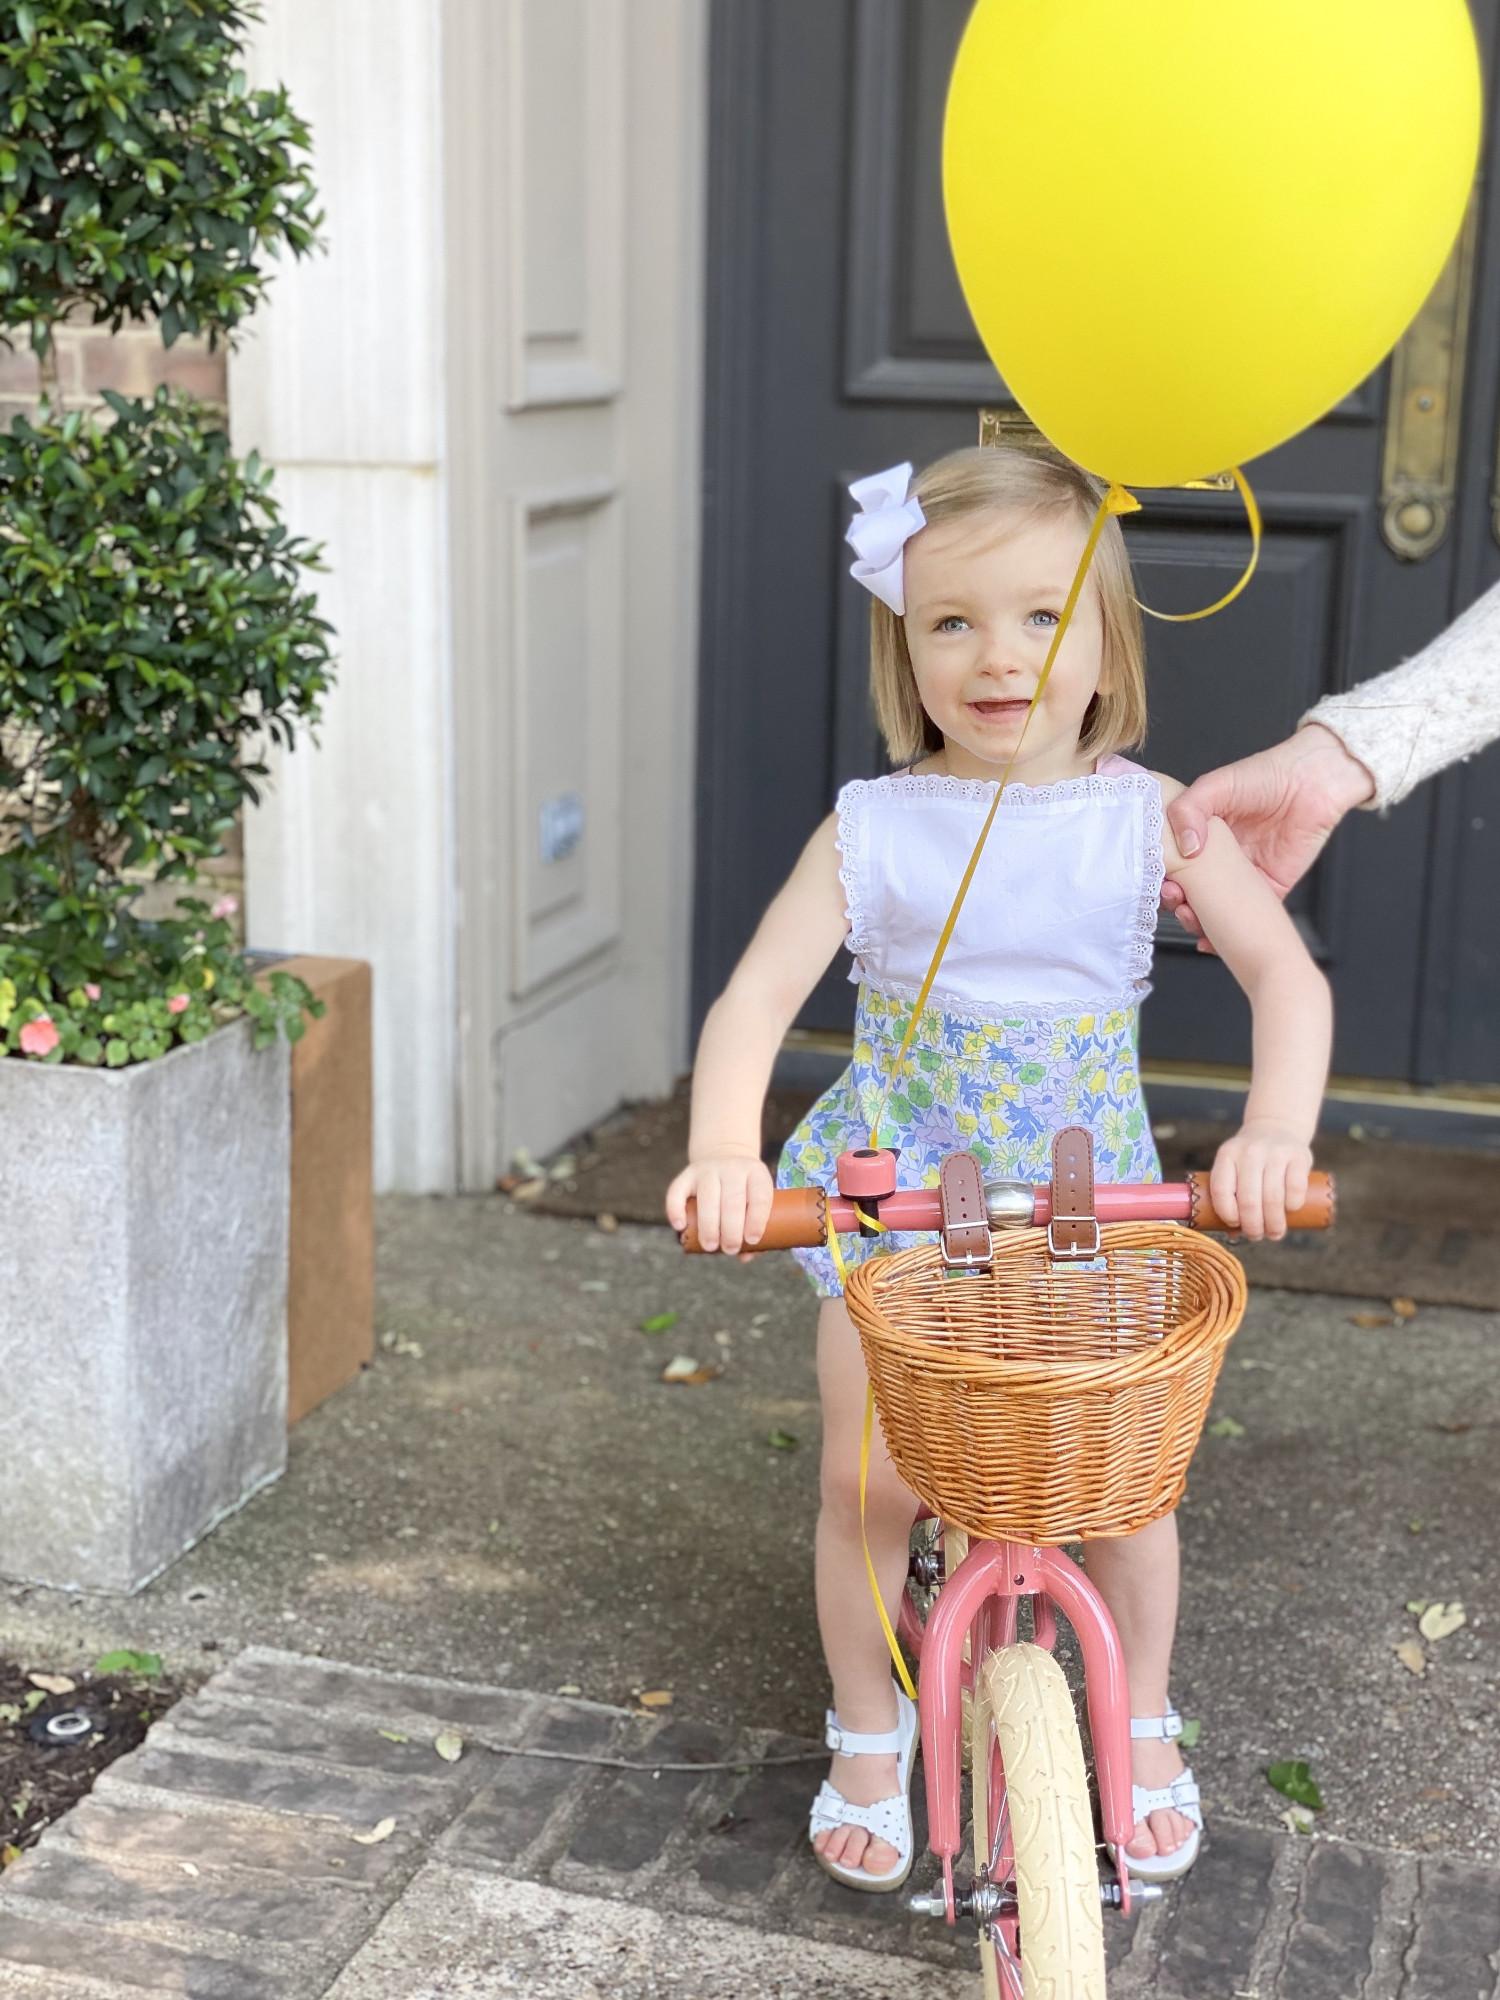 bike for three year old